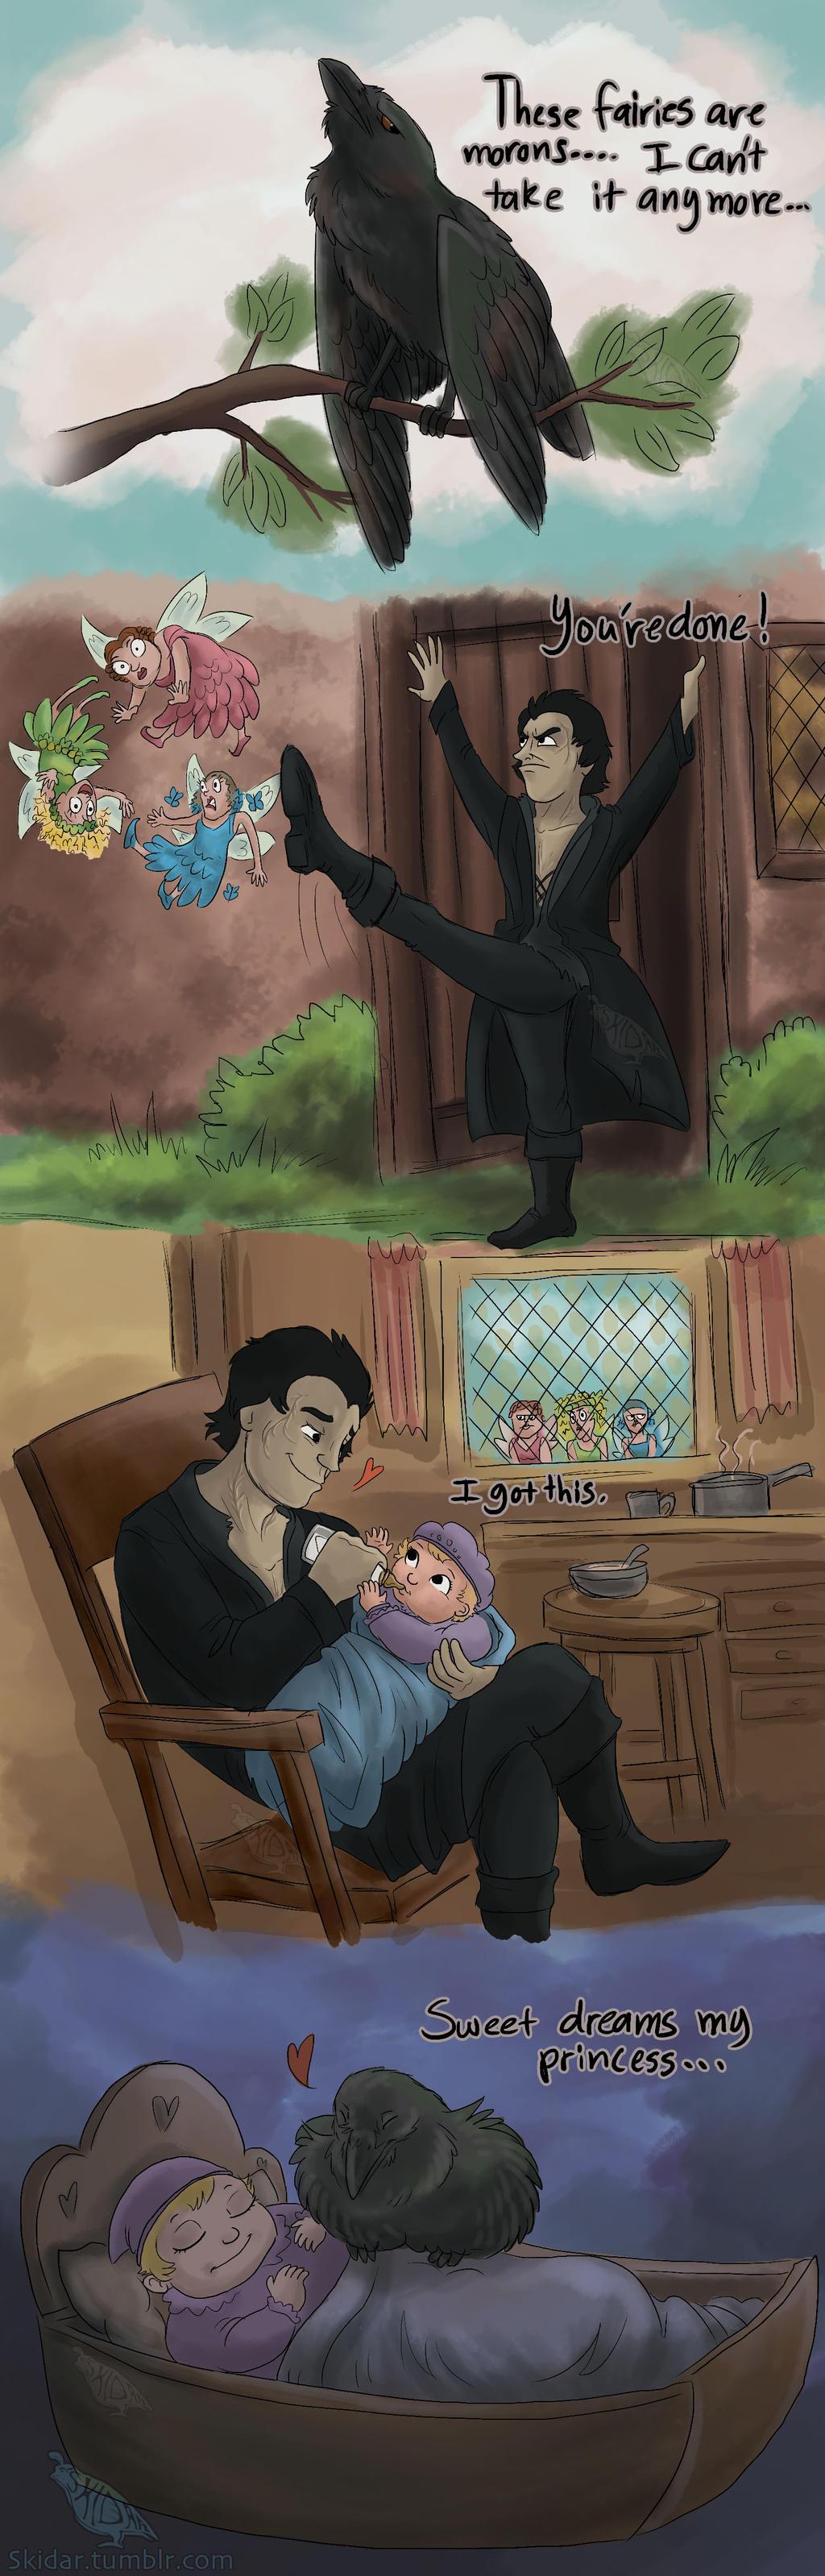 Maleficent Heartwarming Tv Tropes